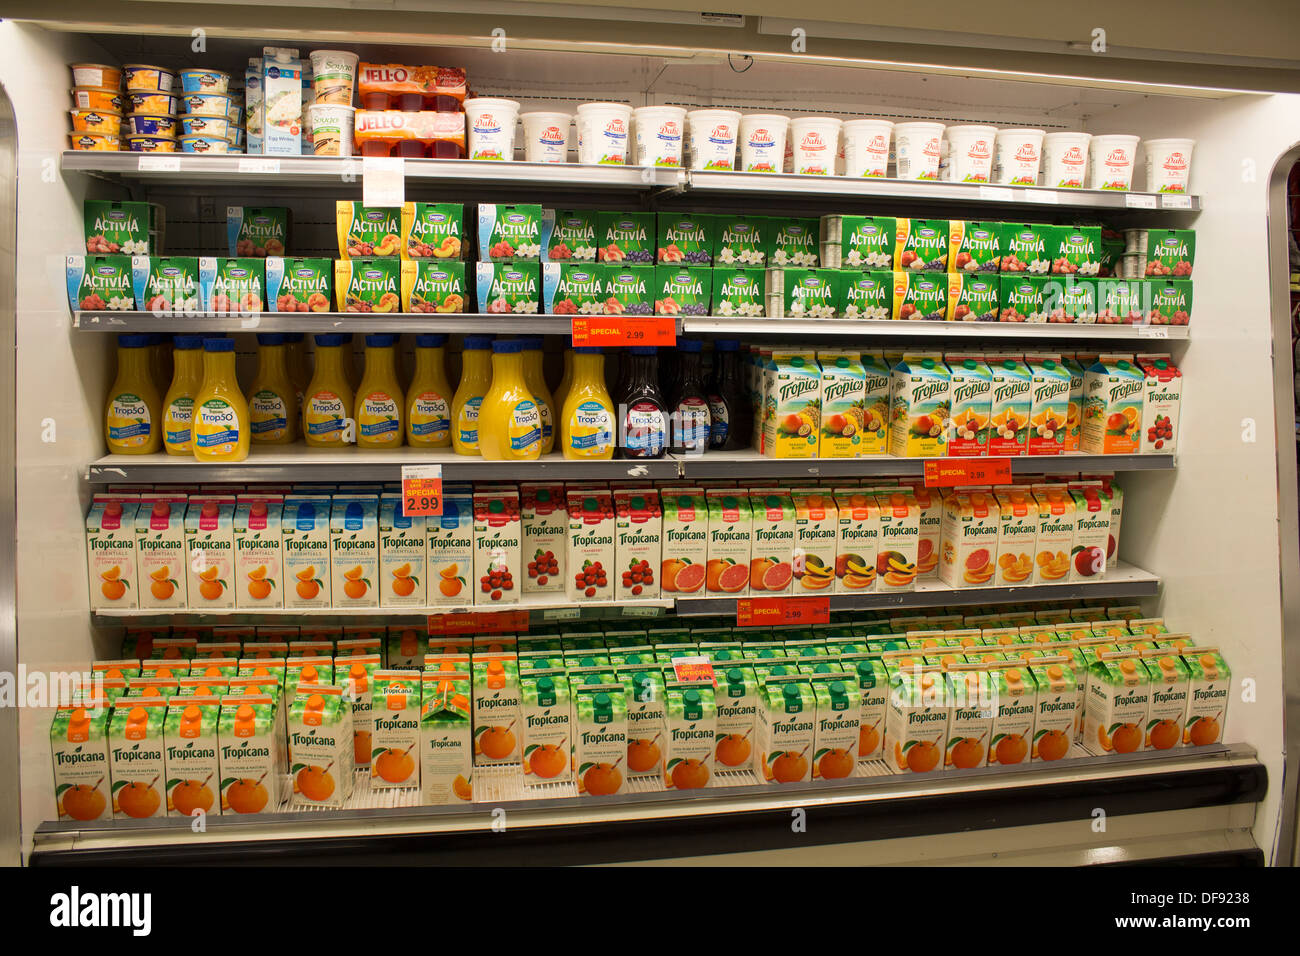 fresh-juice-yogurt-section-of-a-supermar